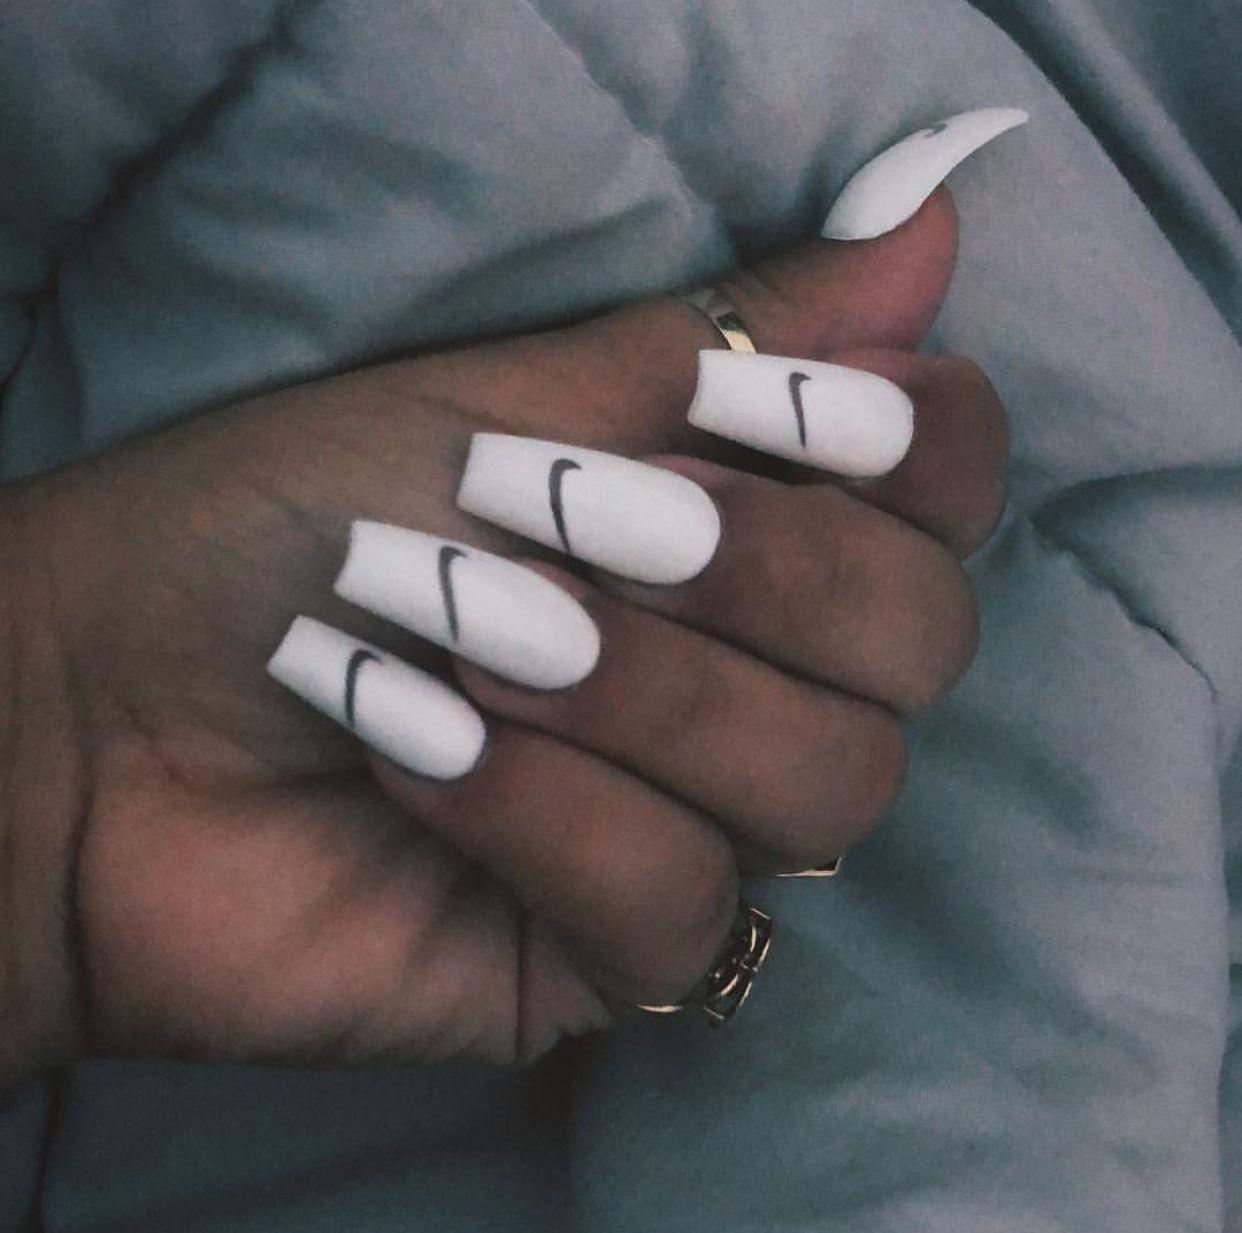 Nike Acrylic Nails Nails Inspiration How To Do Nails Nails